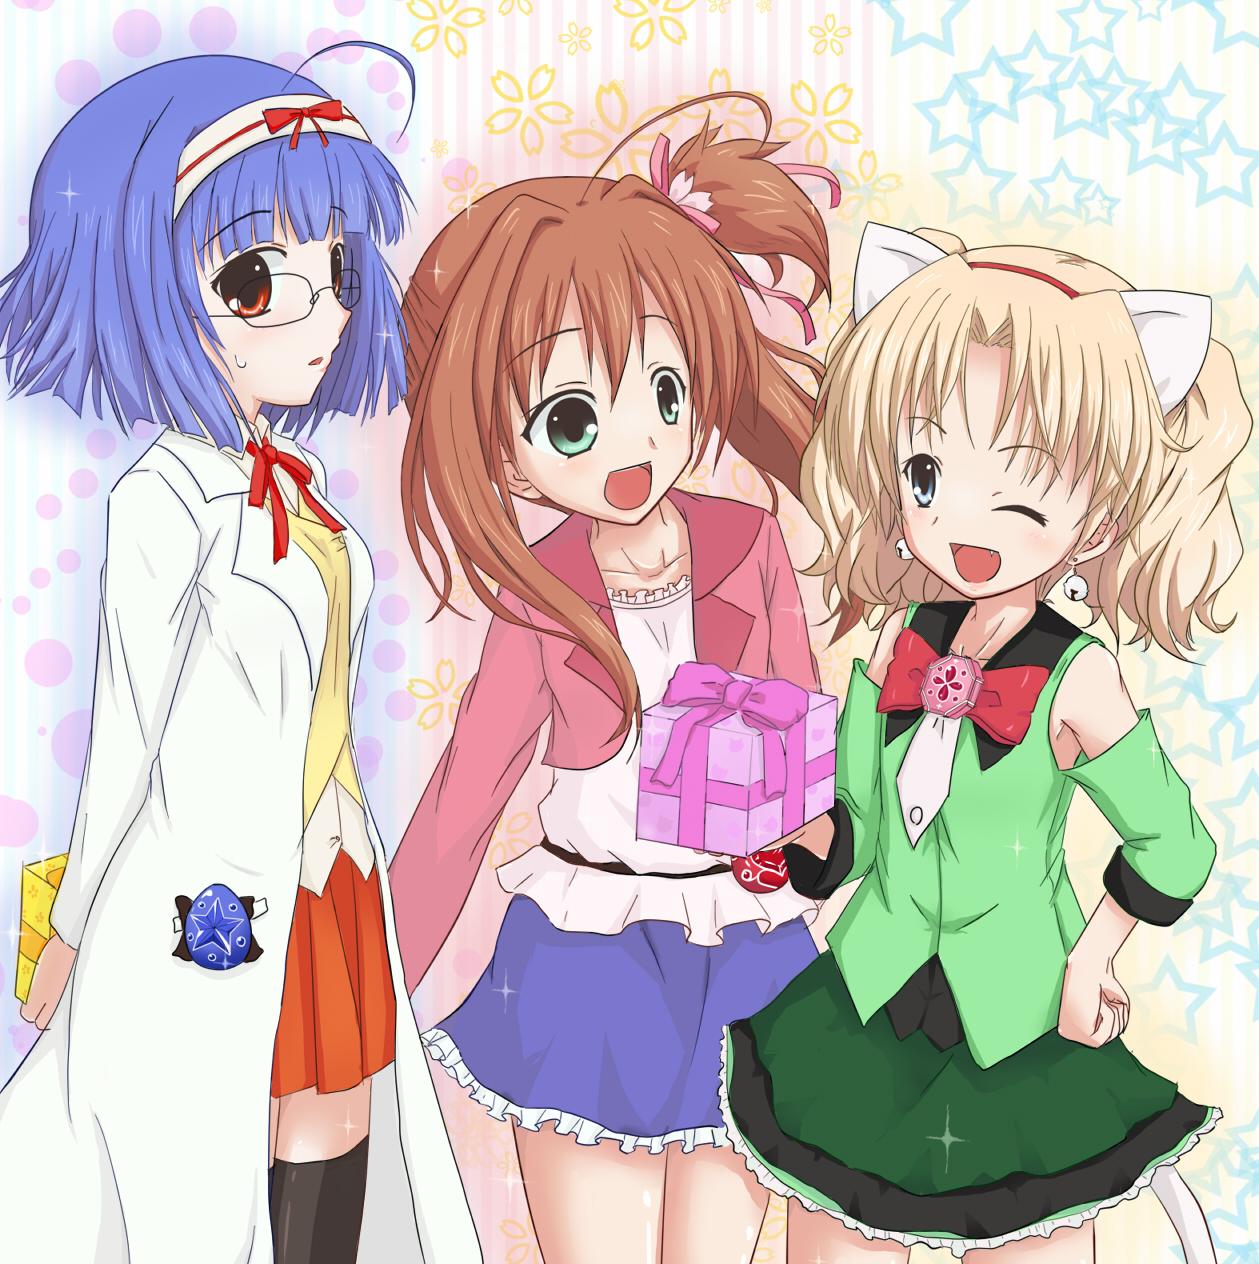 Sara jewelpet tinkle jewelpet tinkle zerochan anime image board - Jewelpet saison 6 ...